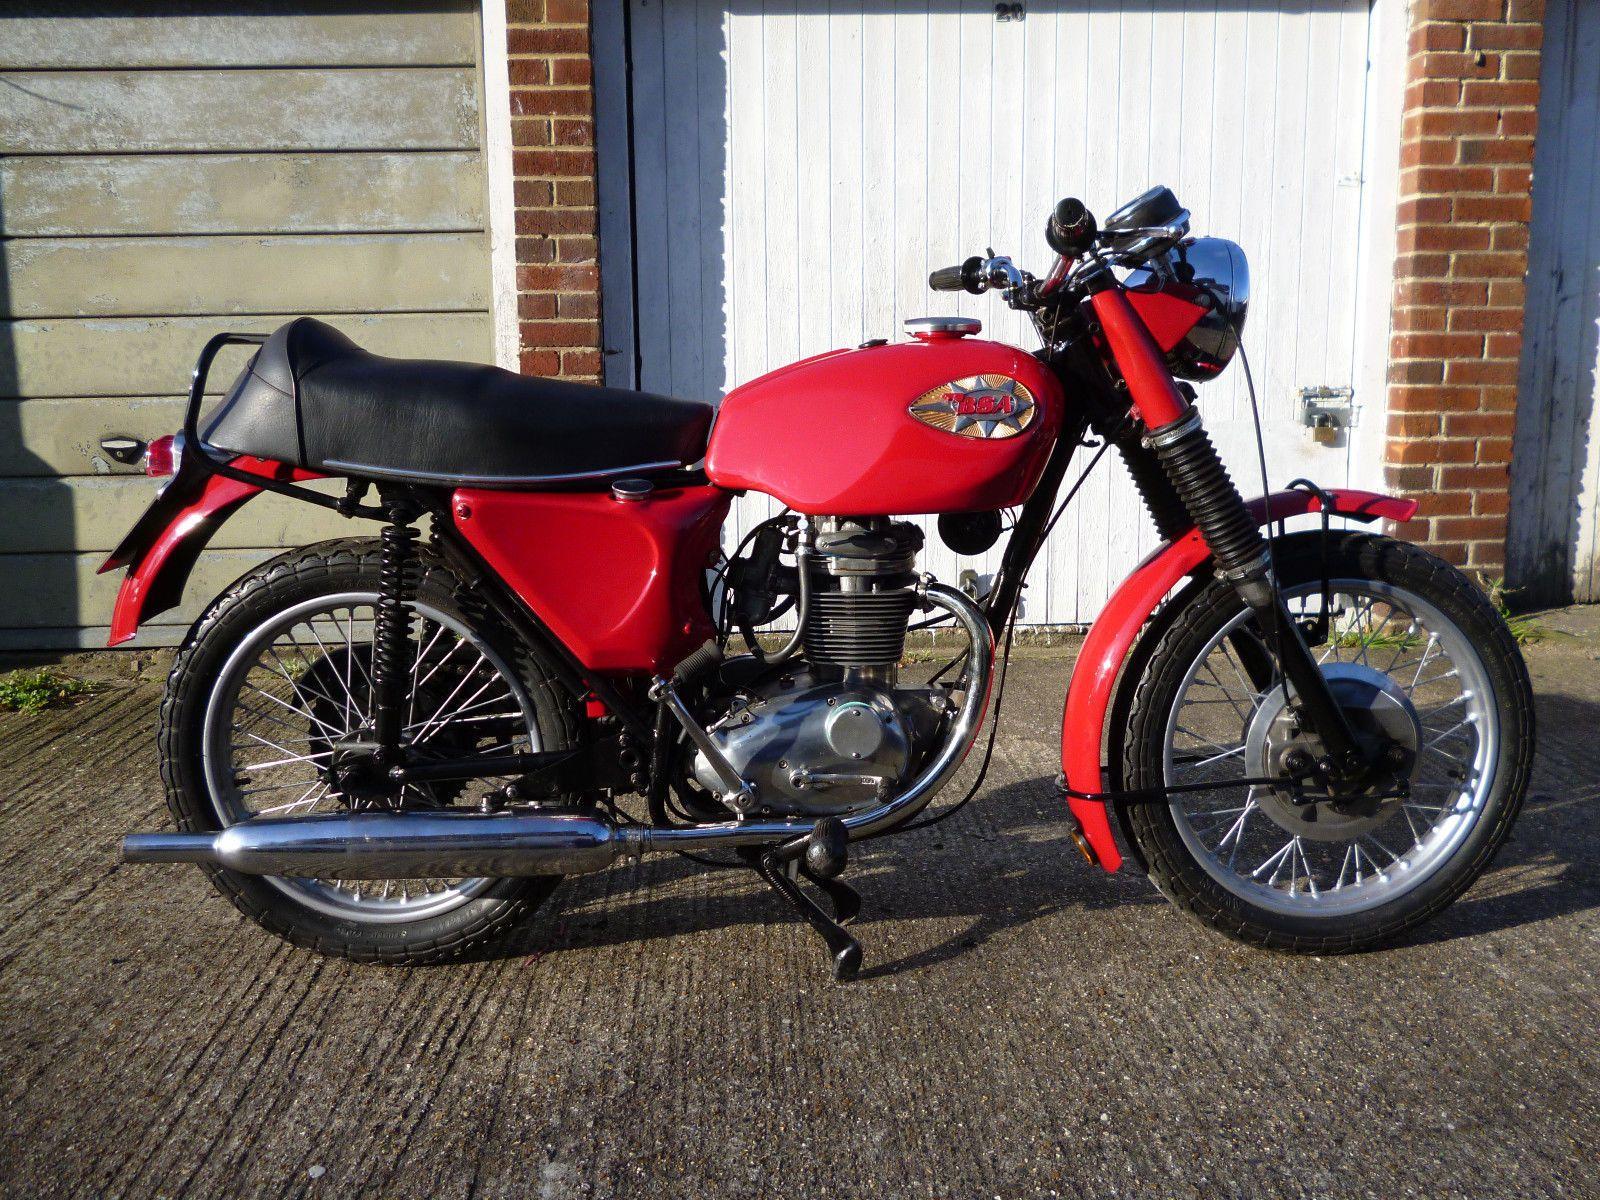 eBay: BSA B25 STARFIRE 250,1969 CLASSIC MOTORCYCLE, MOT'd